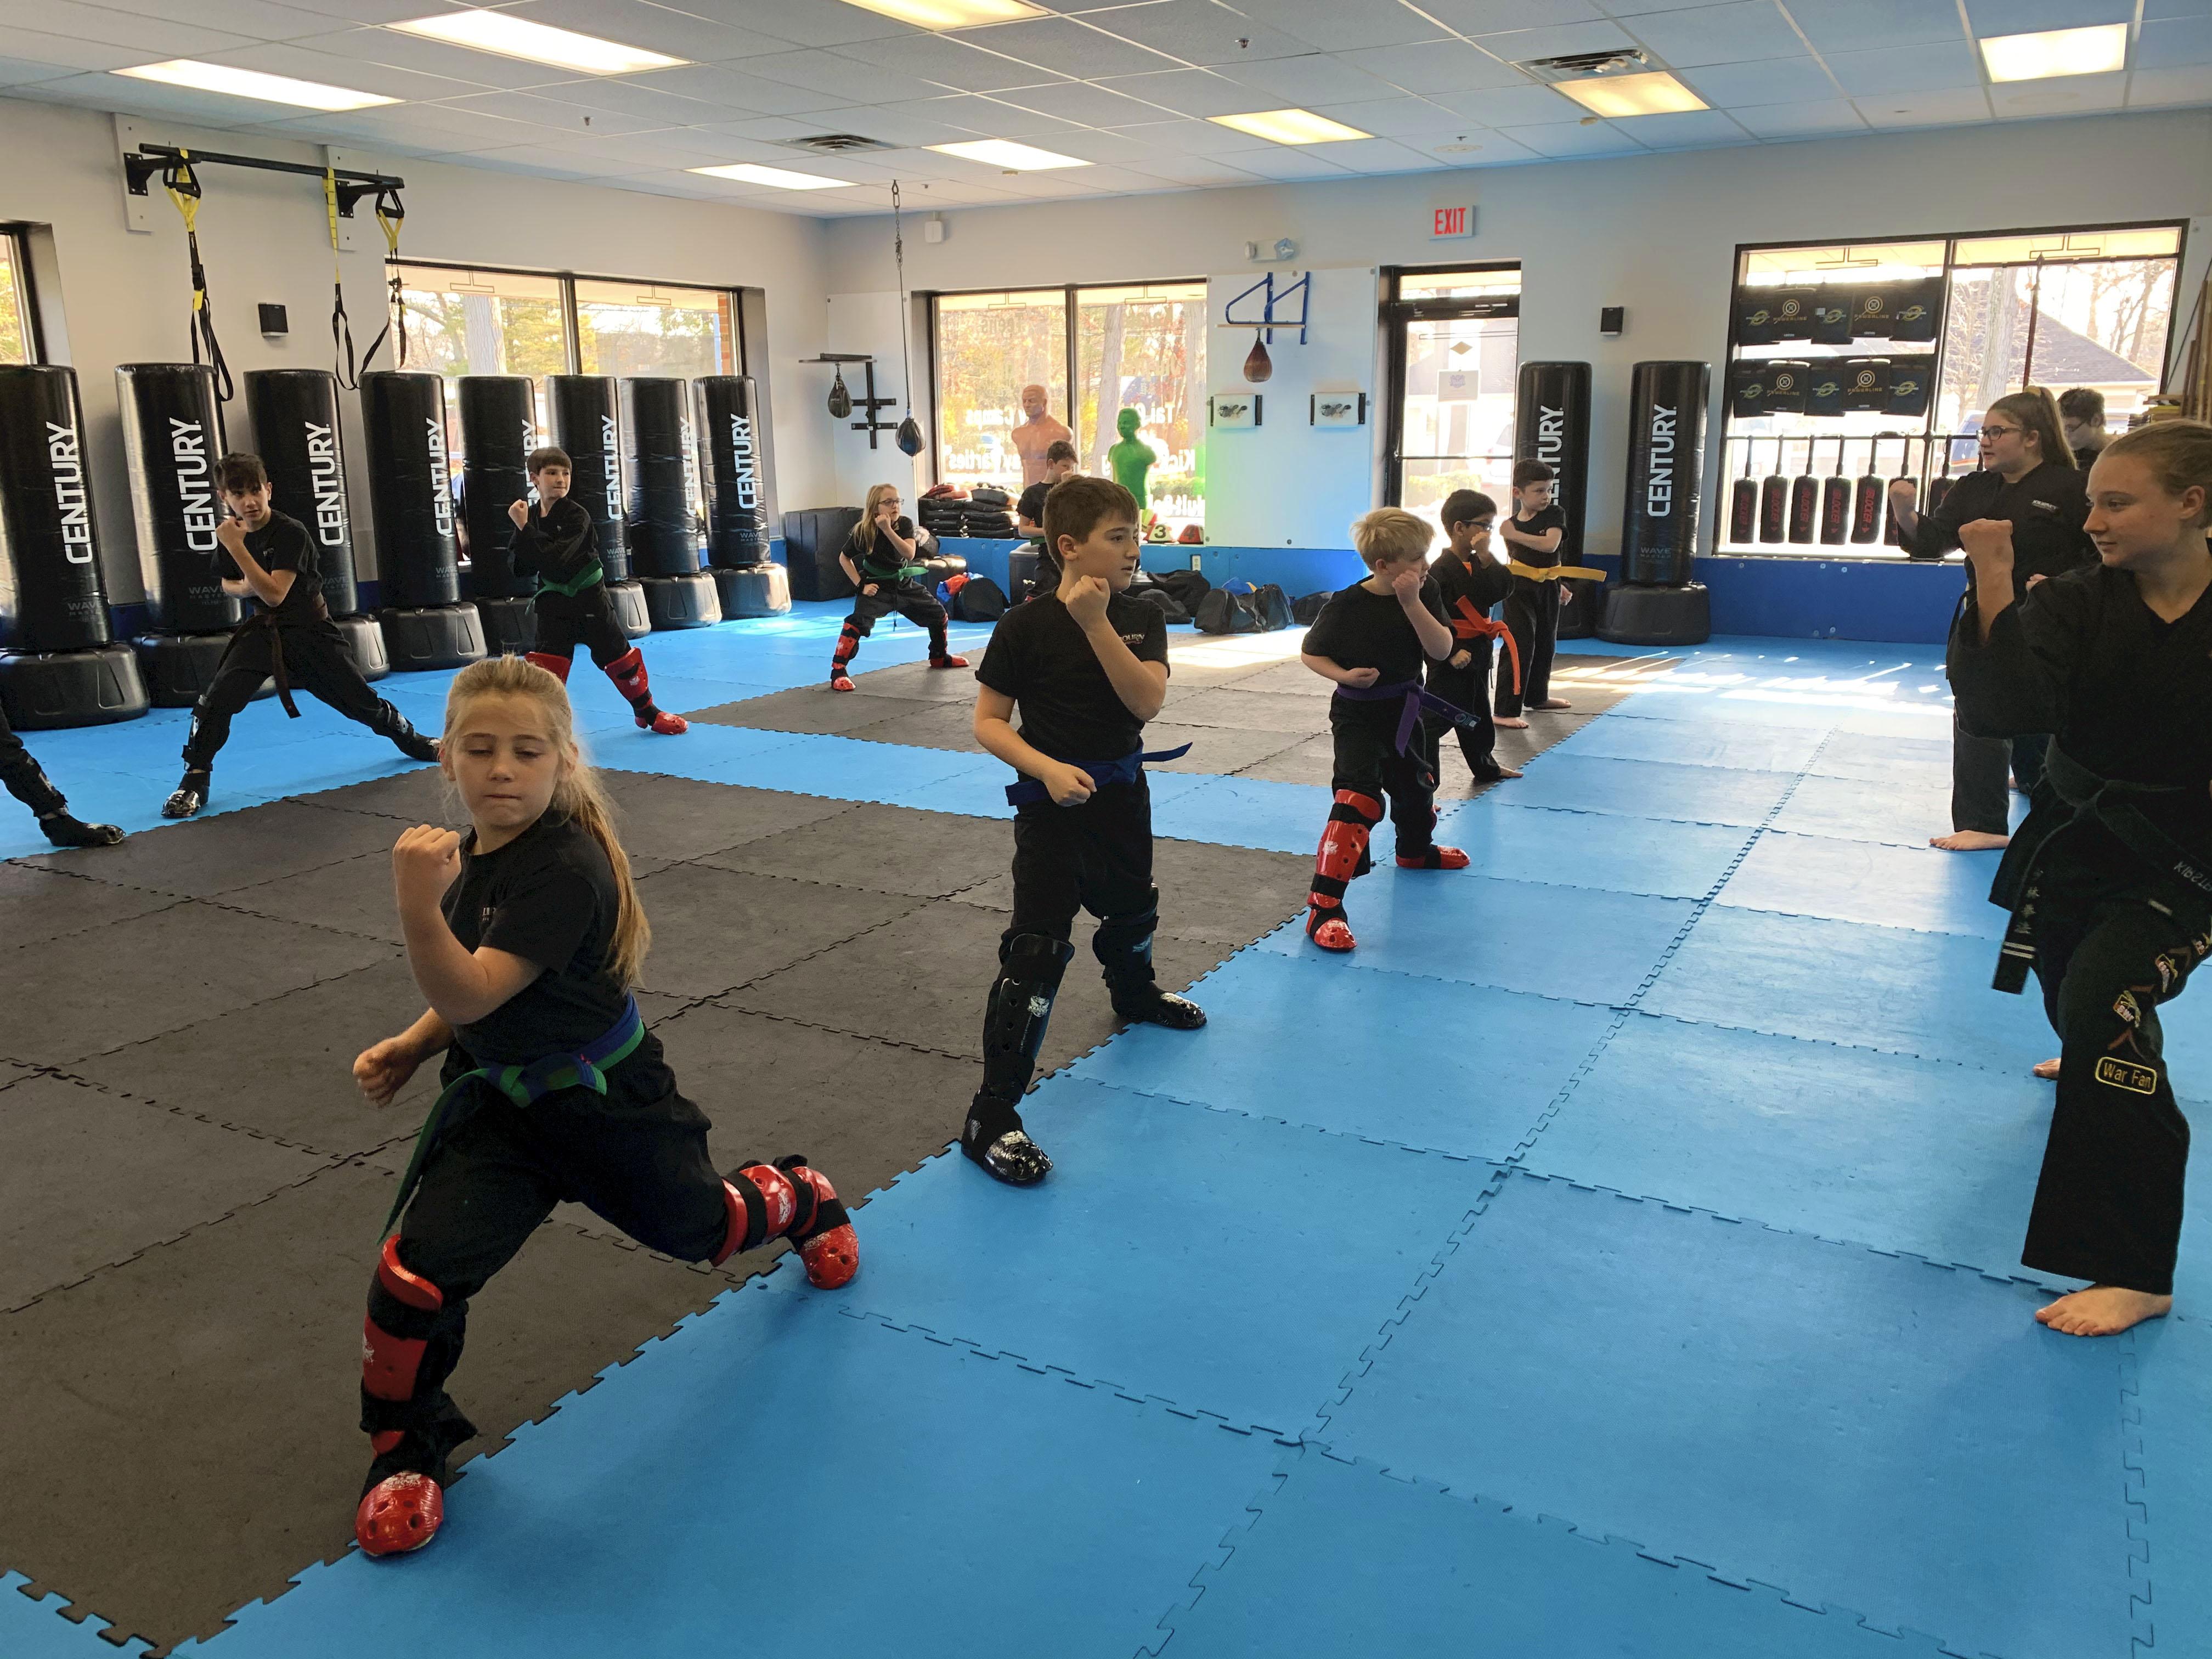 Kempo Karate Martial Arts Kids doing basics